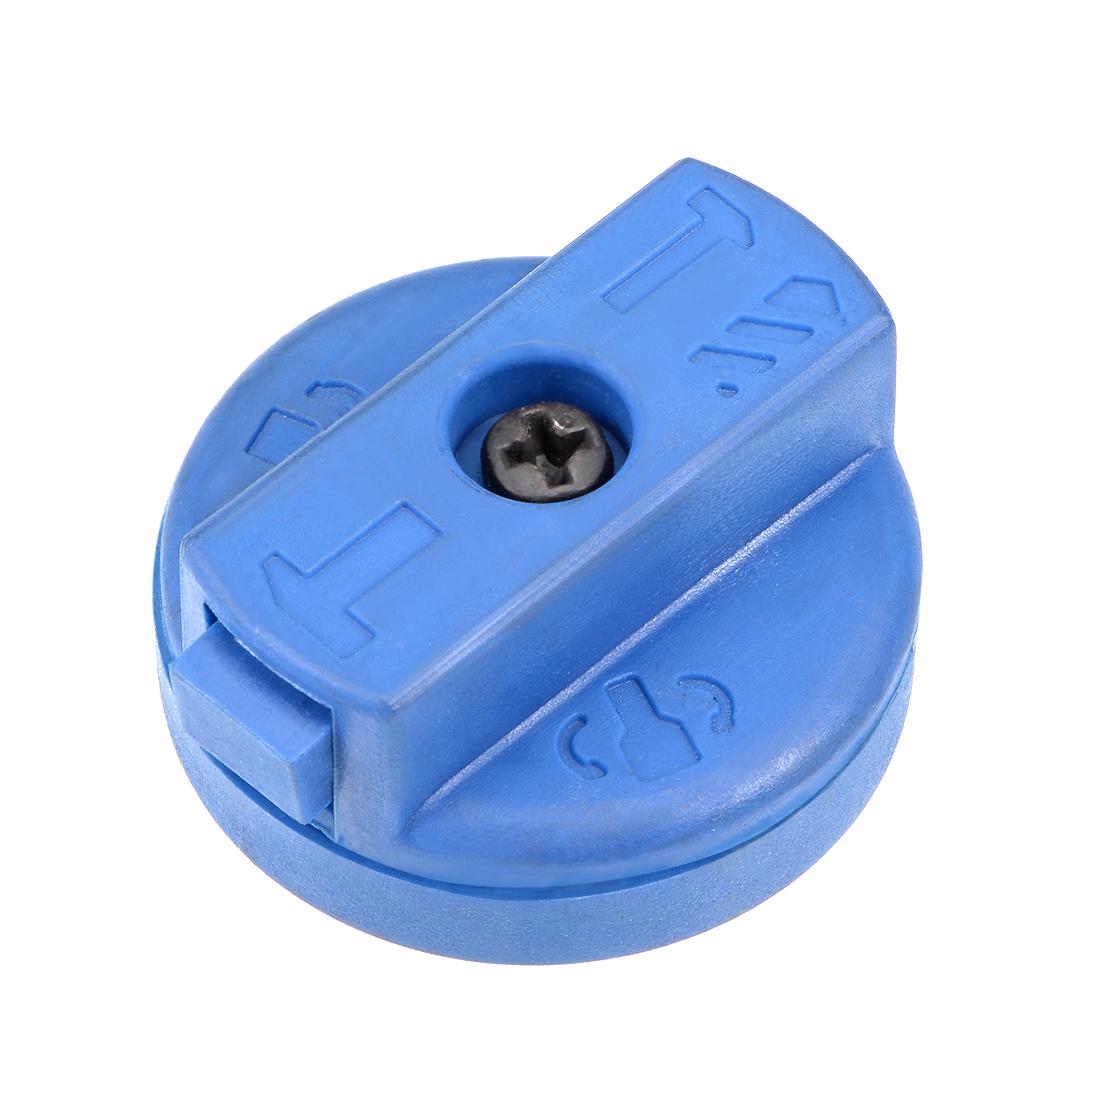 Electric Drill Hammer Trigger Switch Knob Tool Power Adjusting Gear #20